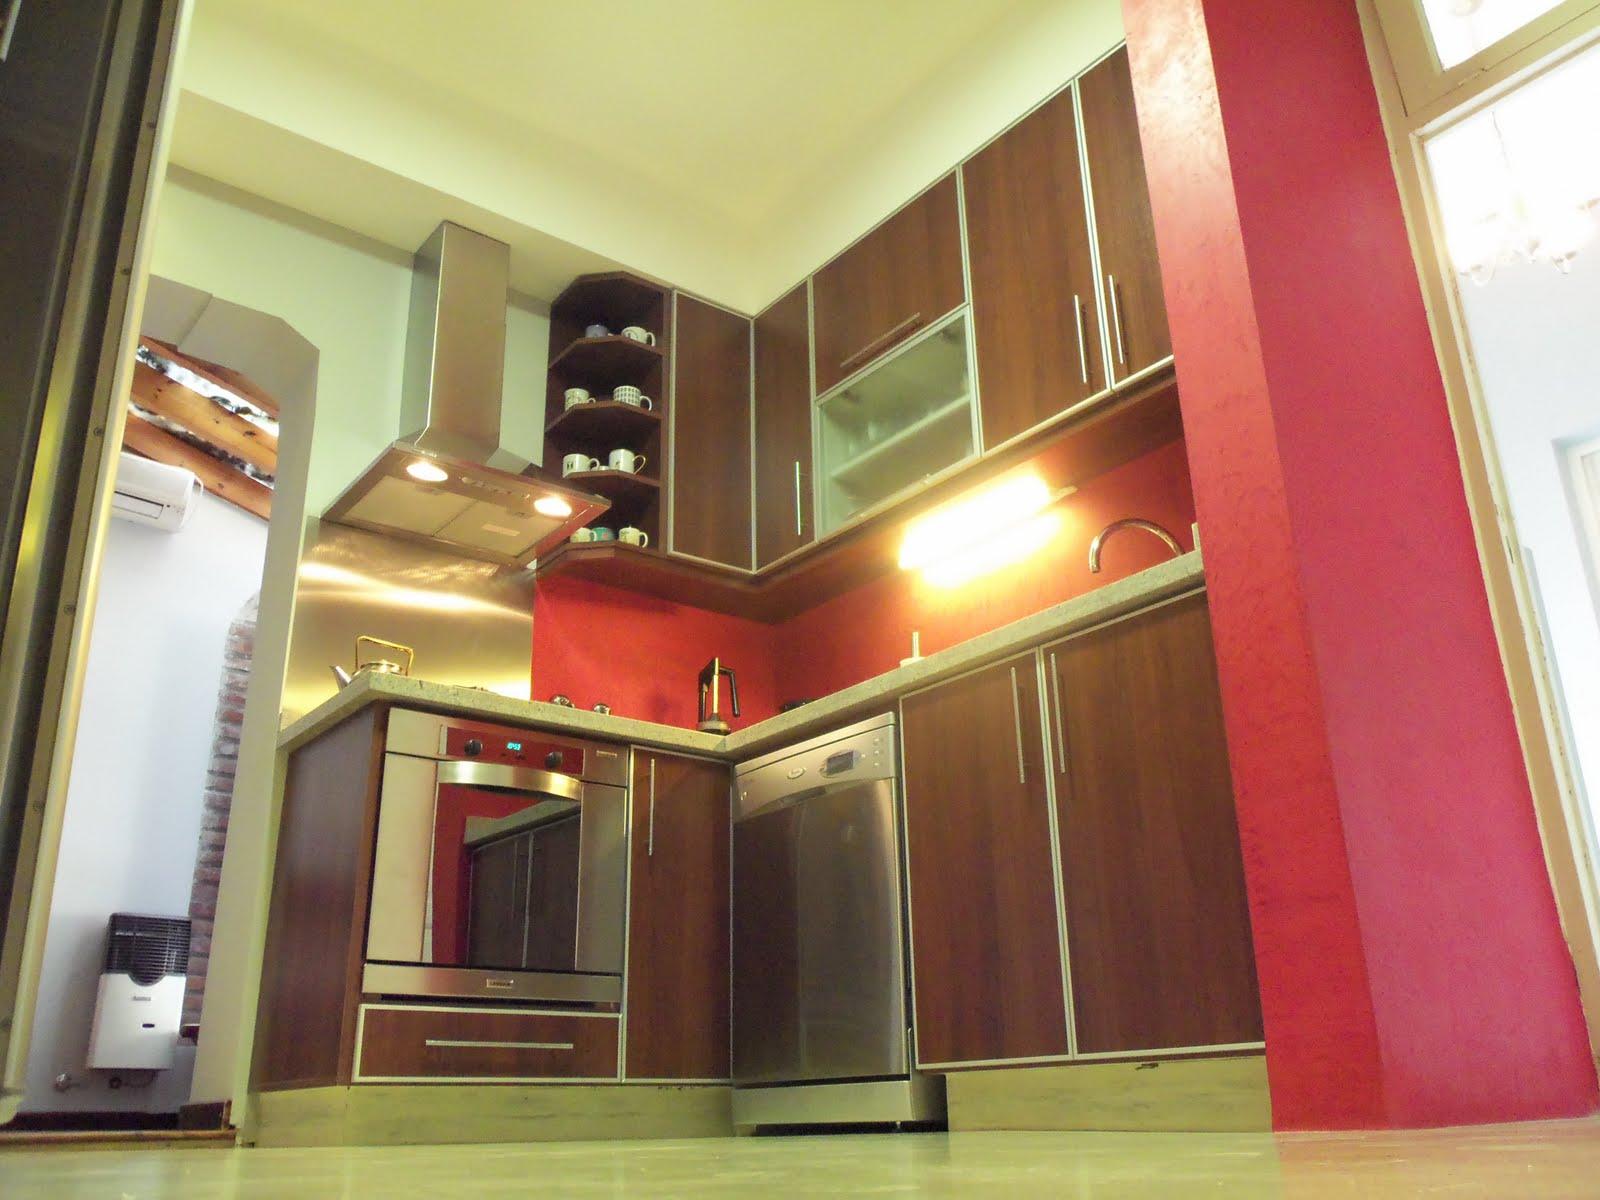 Deco vanguardia cocina moderna y tecnologica for Deco cocinas modernas